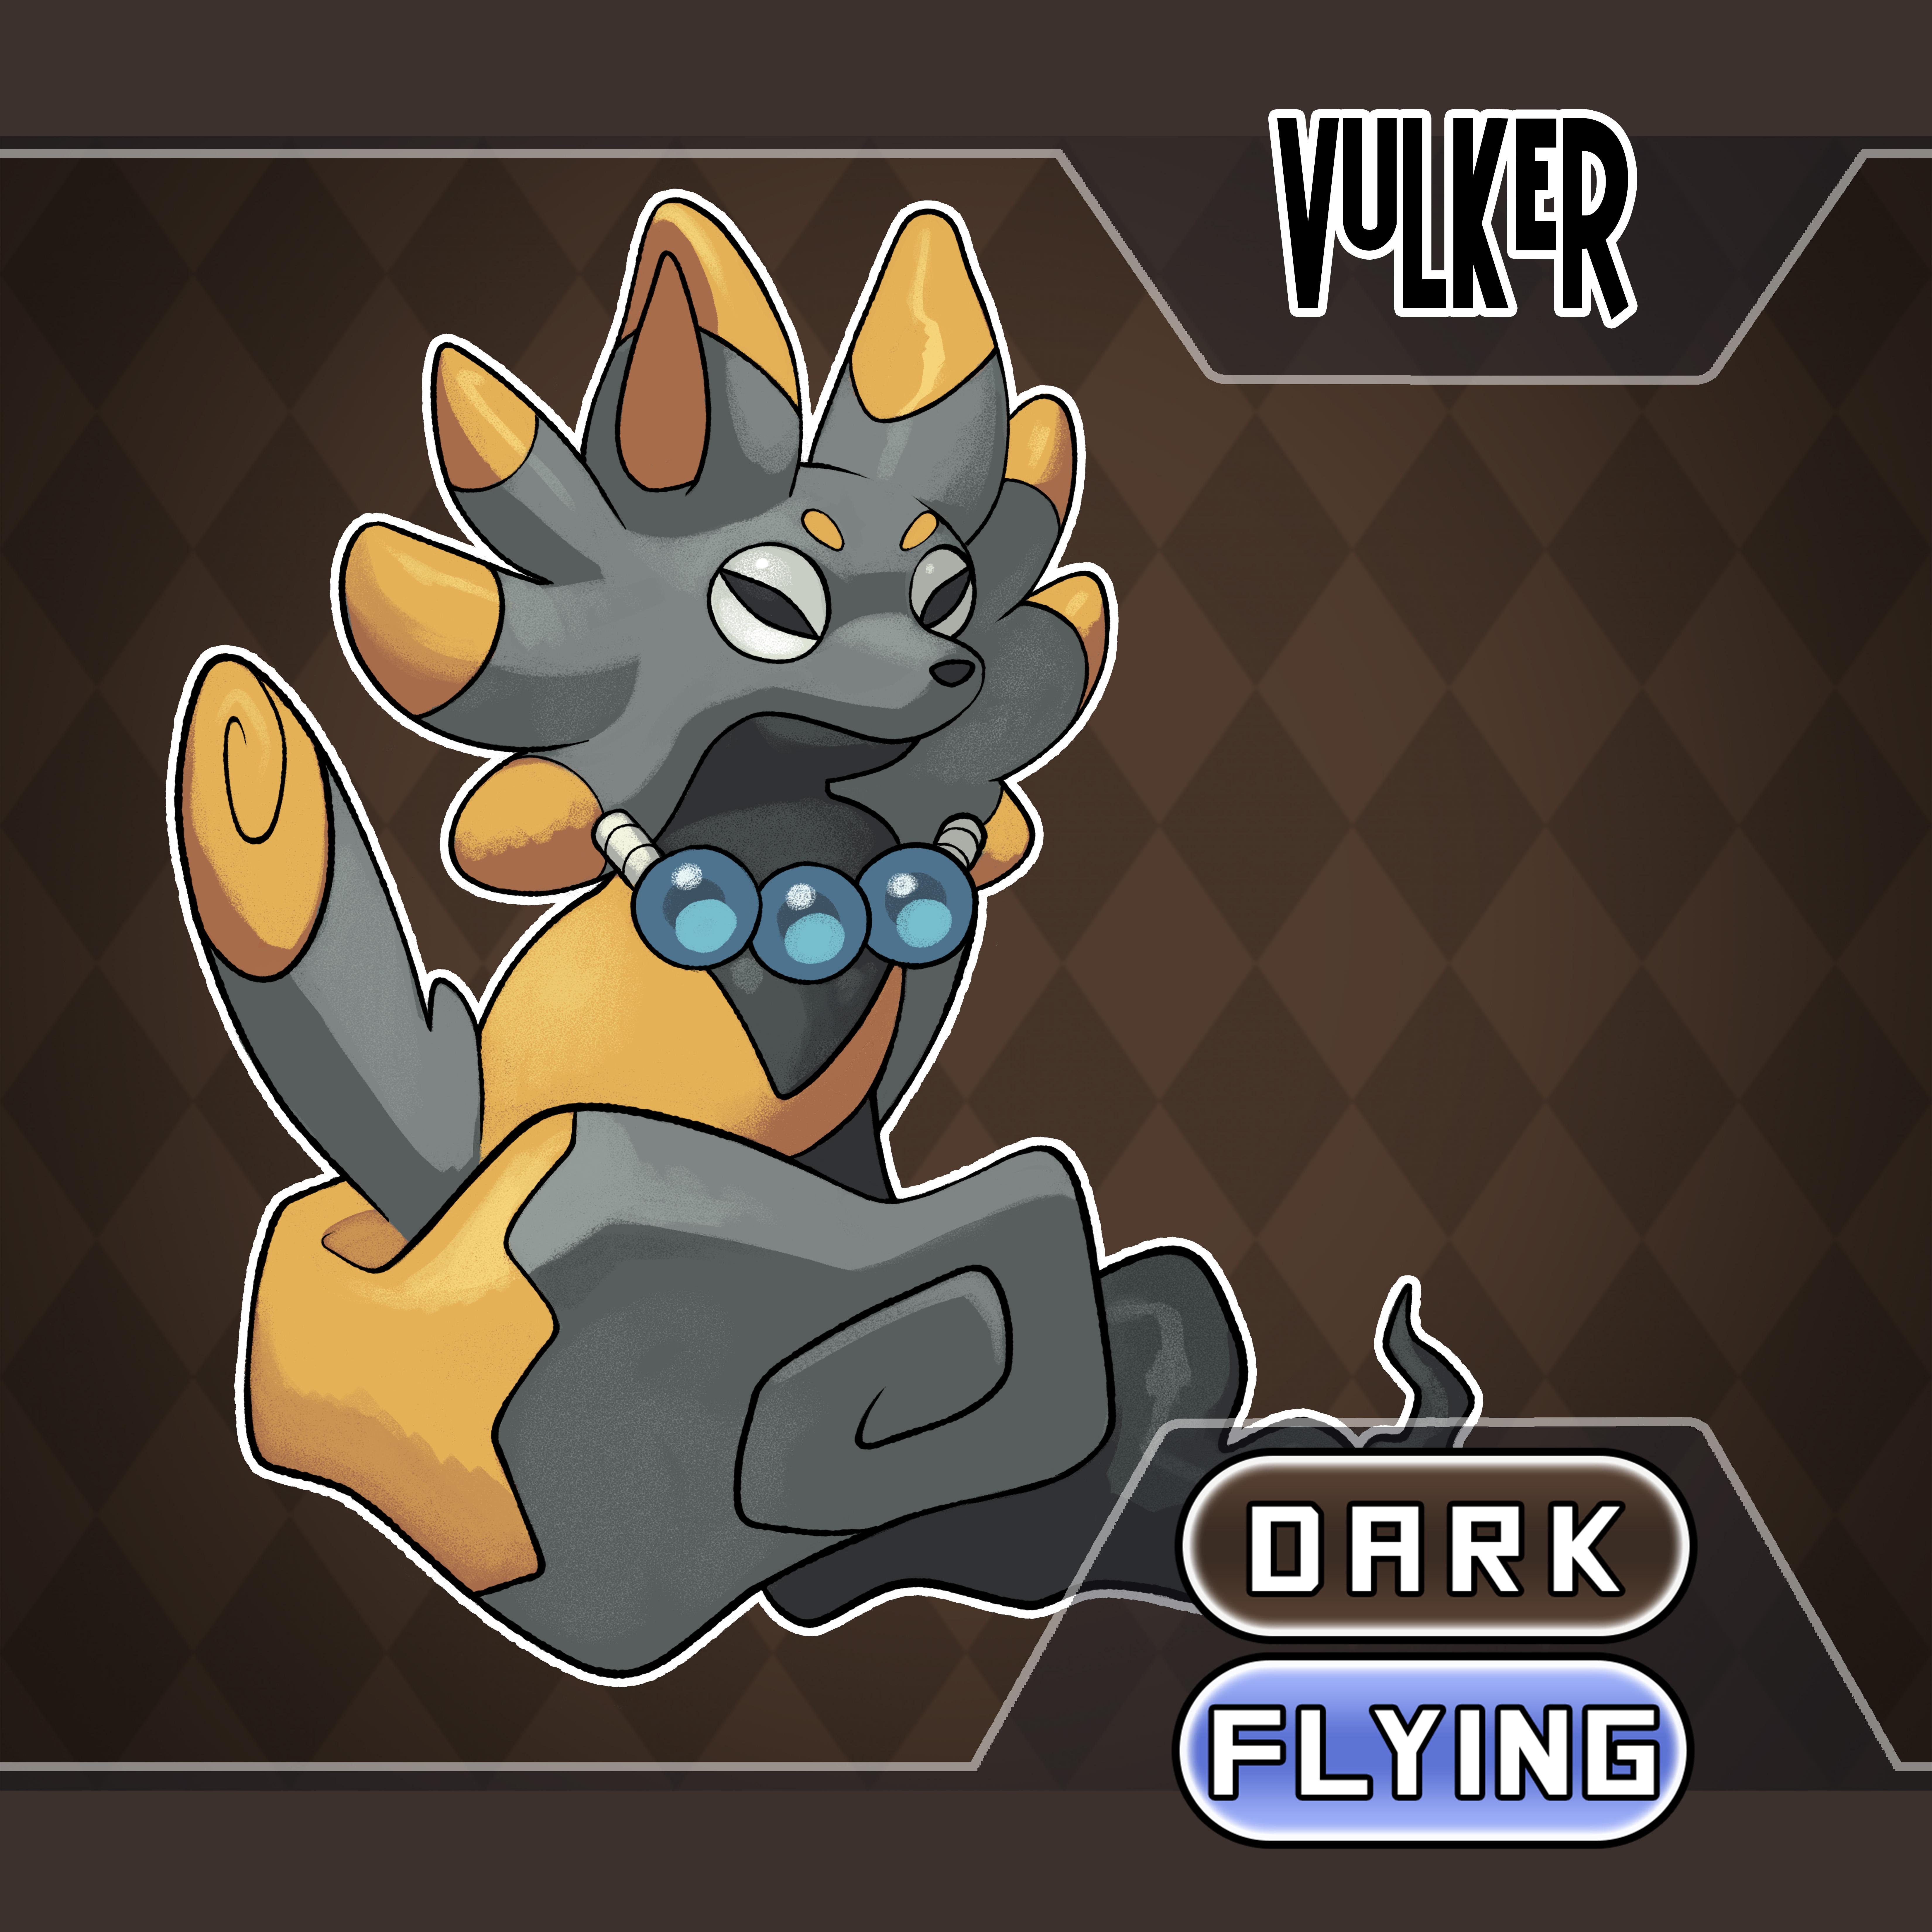 Individual Vulker